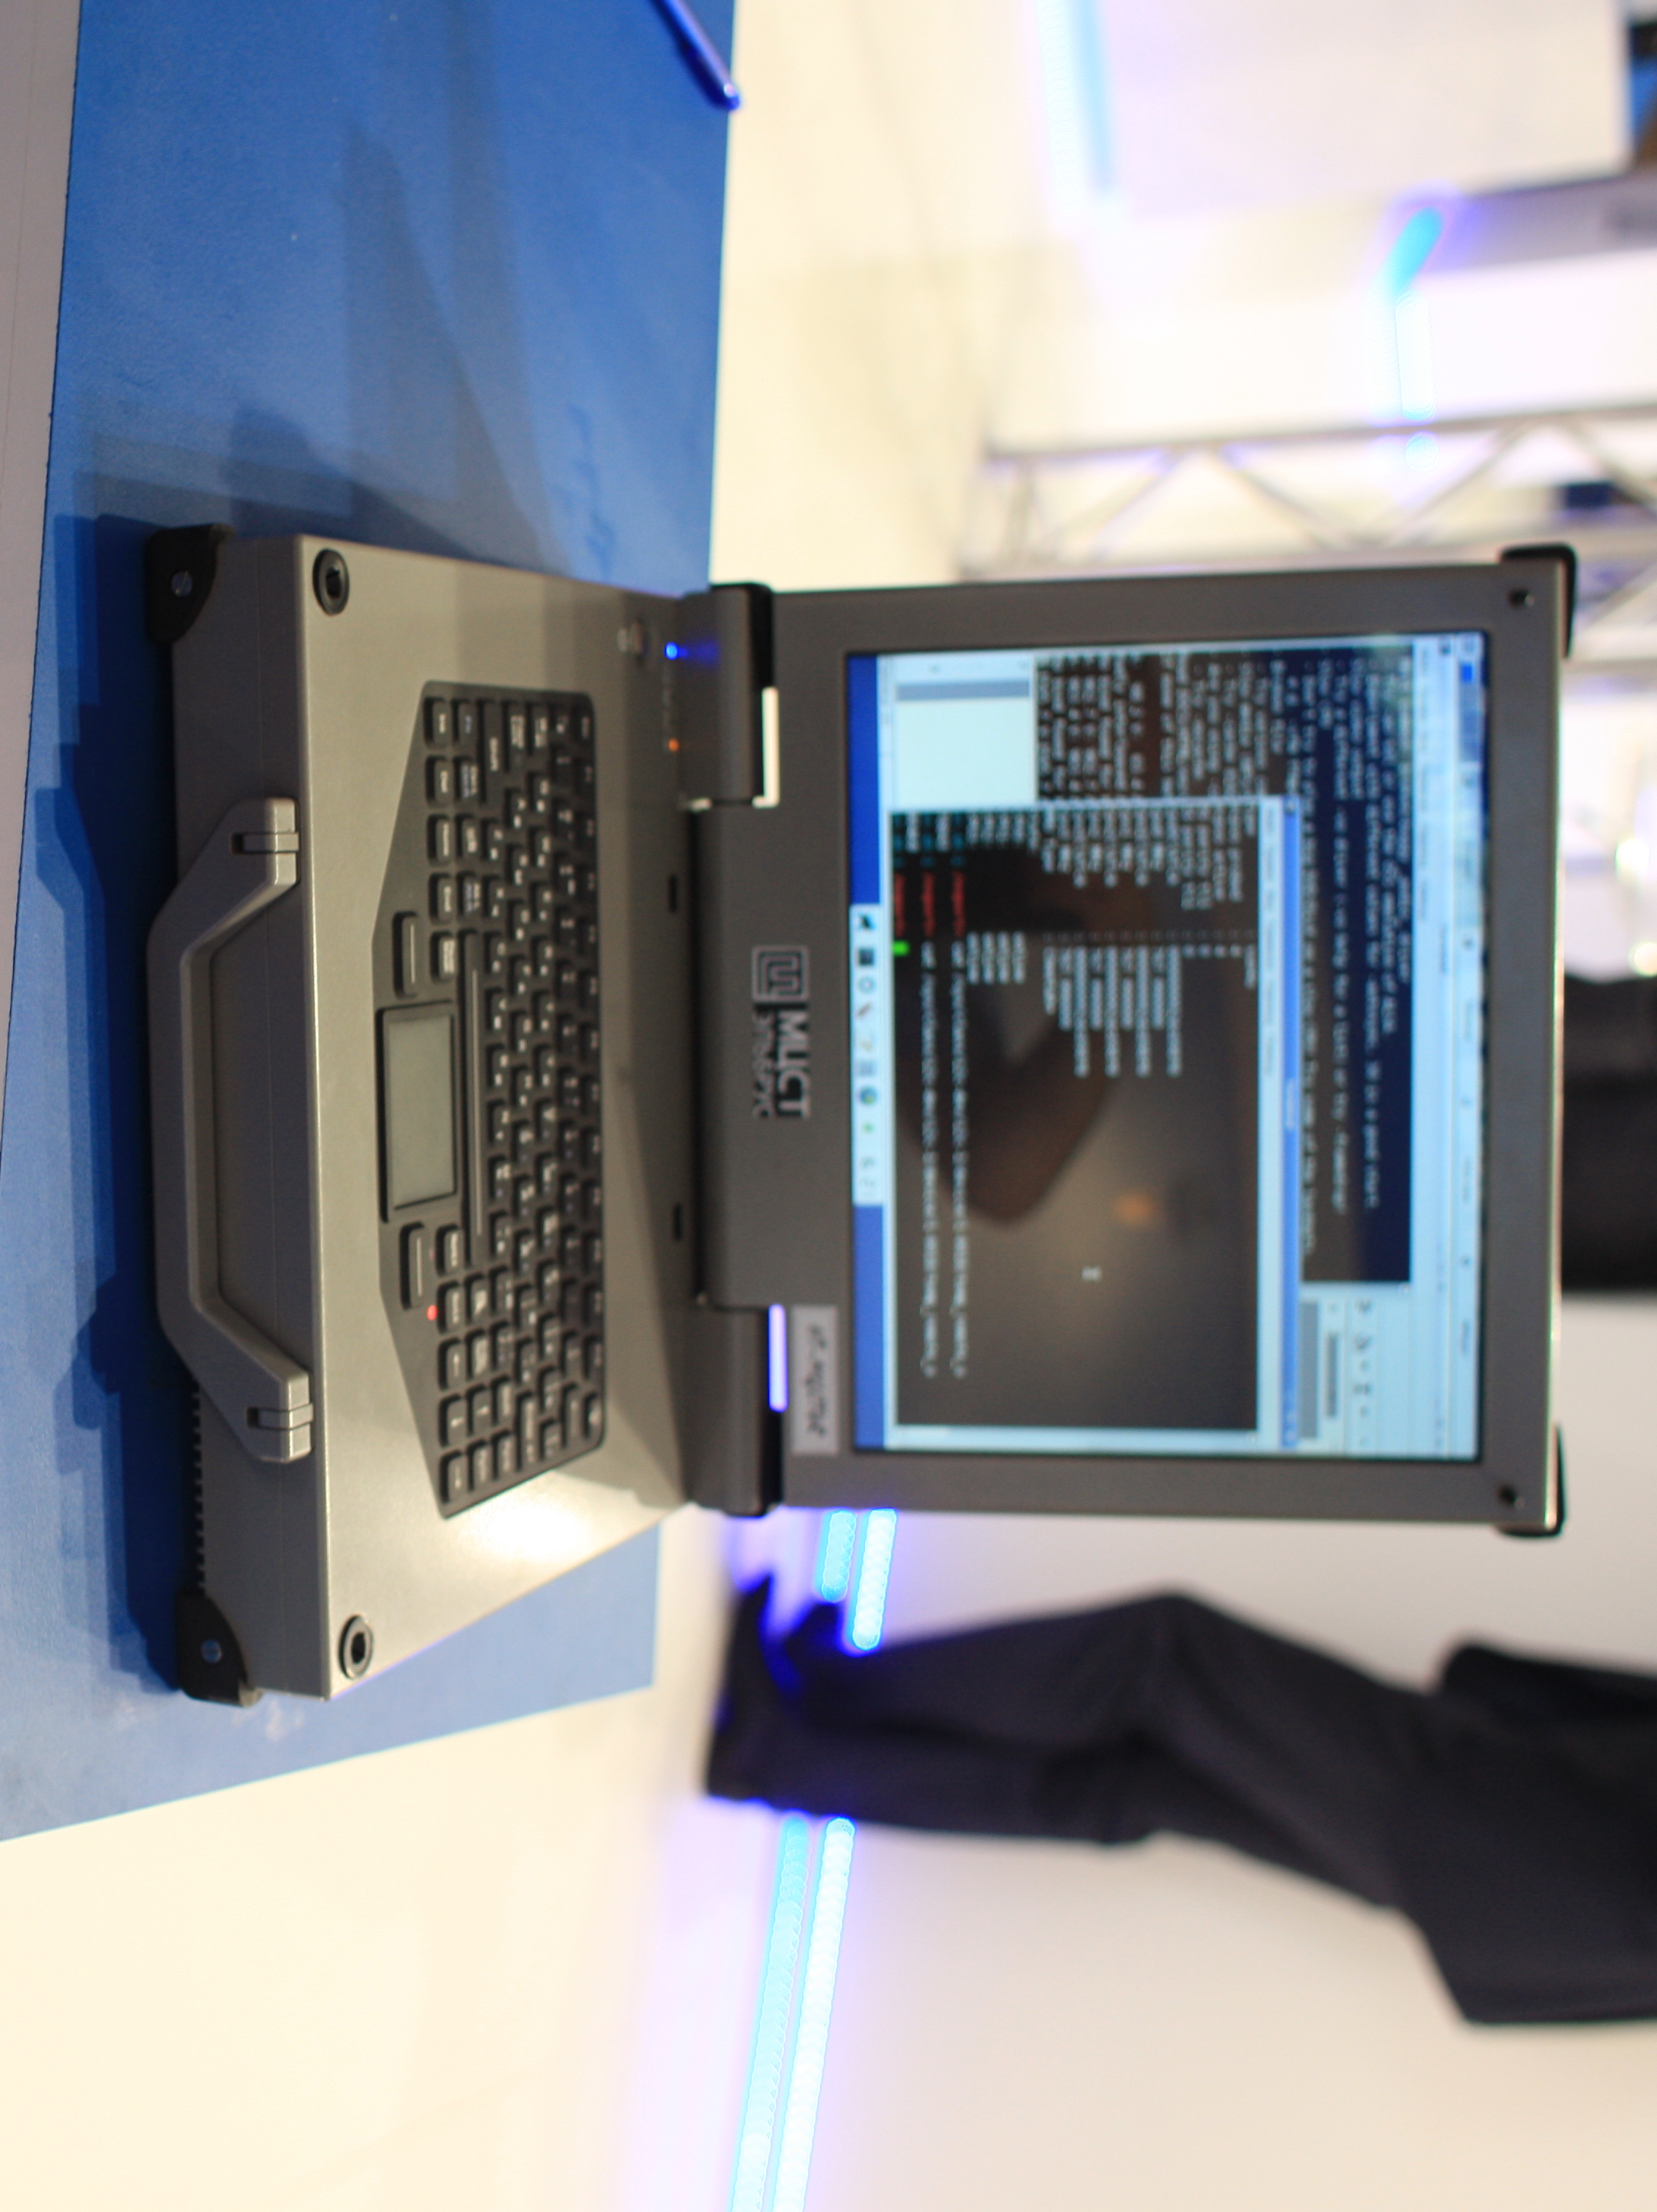 MCST_HT-R1000_Elbrus_laptop running some form of minimalistic linux desktop